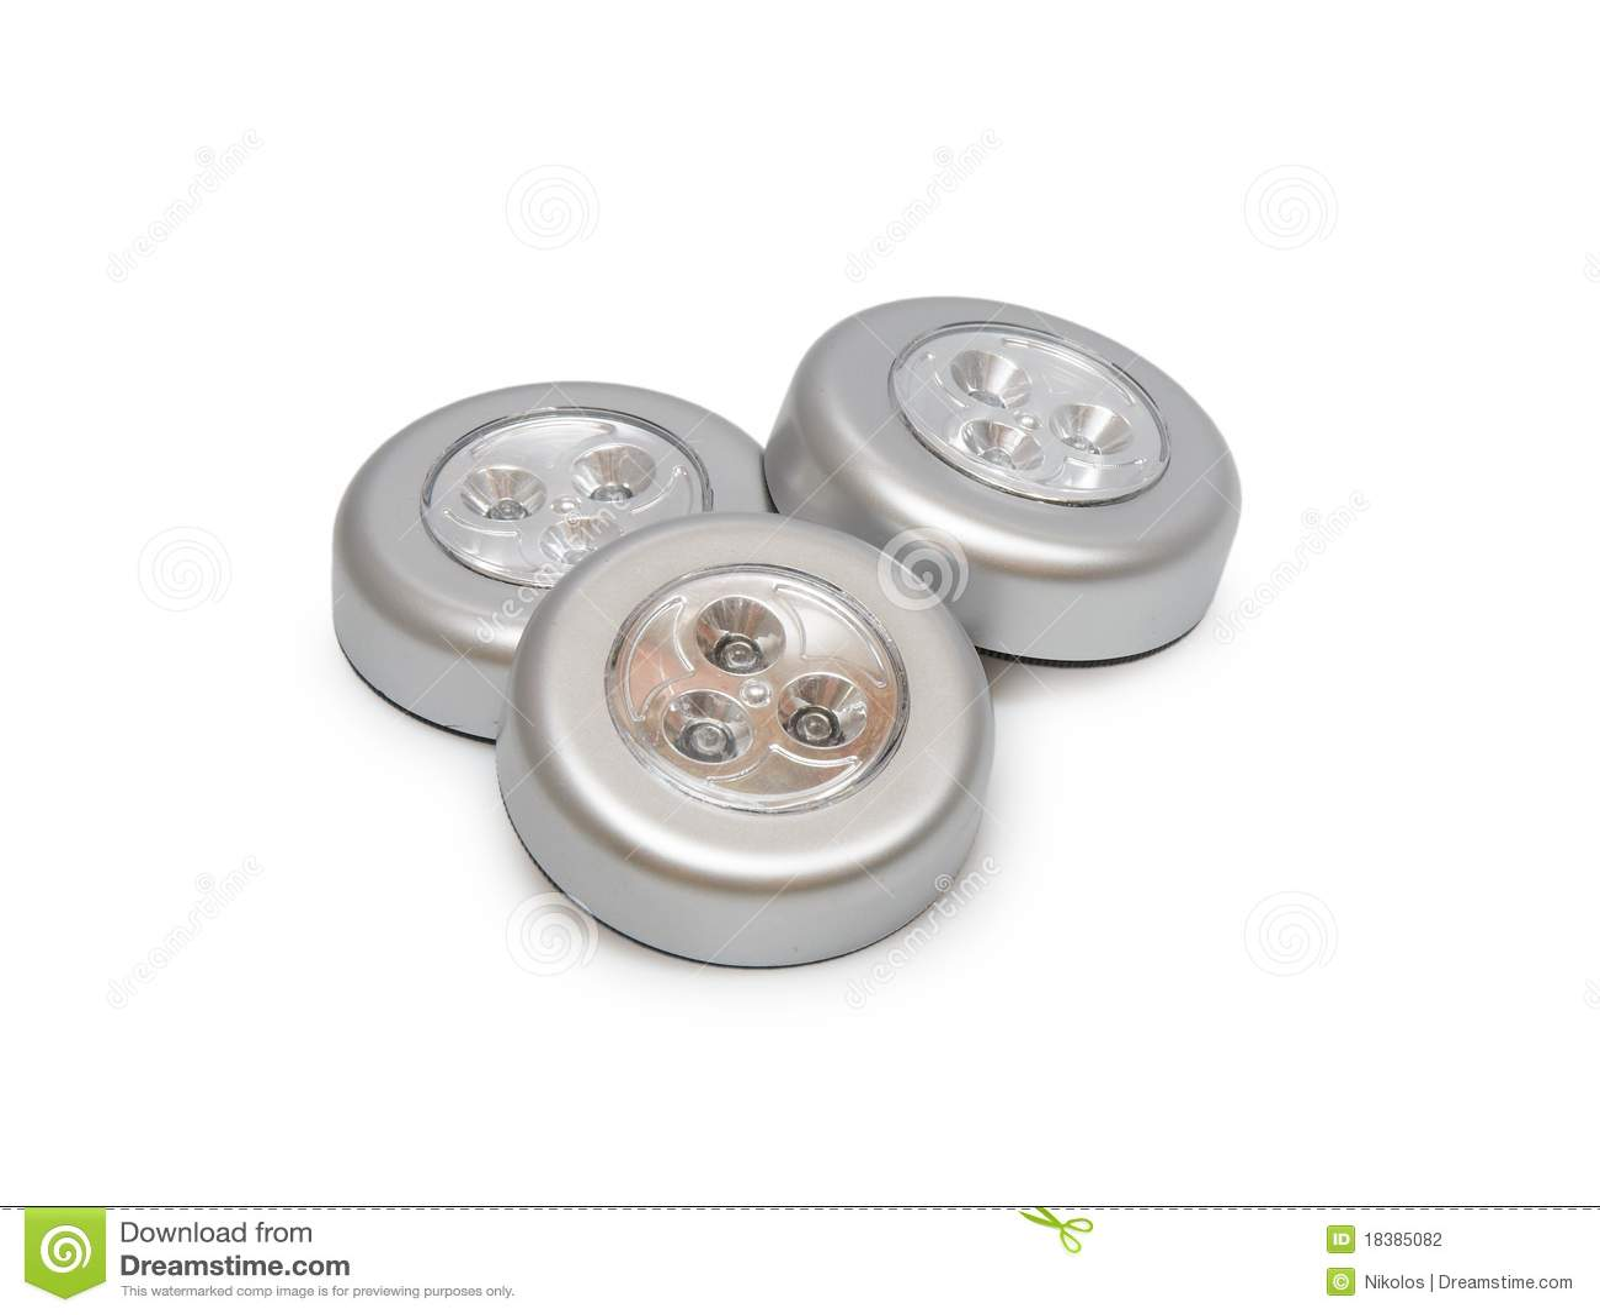 фонарик электрофонарей вокруг 3